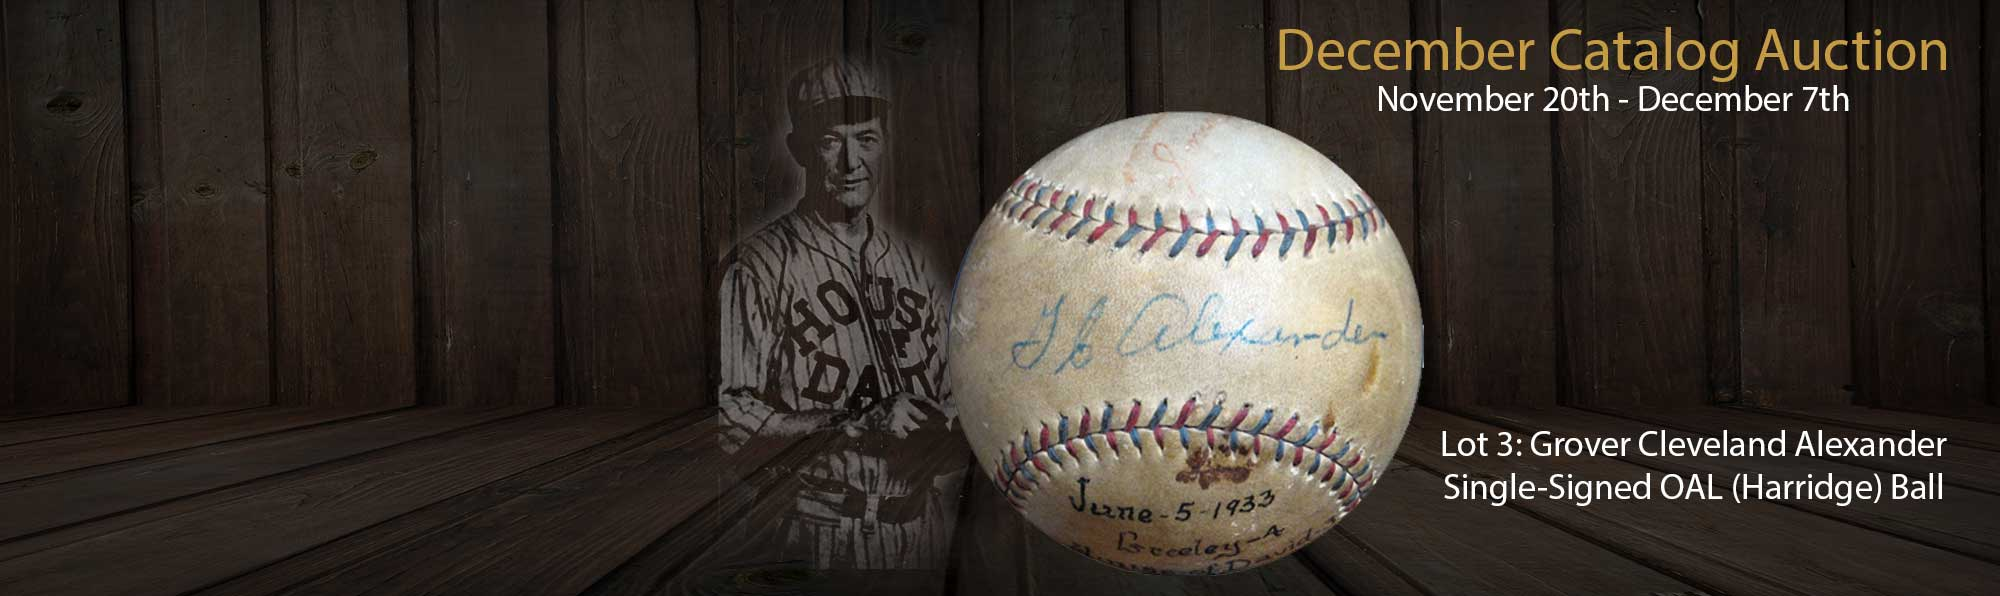 Grover Cleveland Alexander Signed Ball